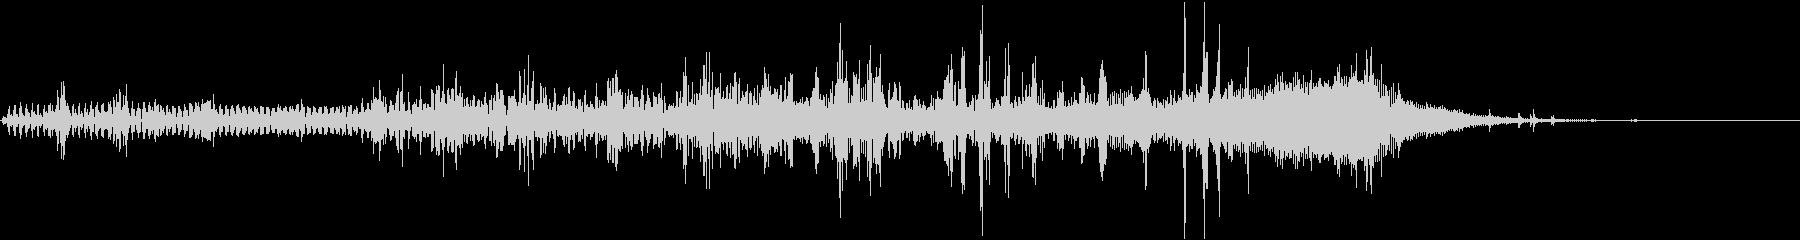 【SE 効果音】不気味な音2の未再生の波形